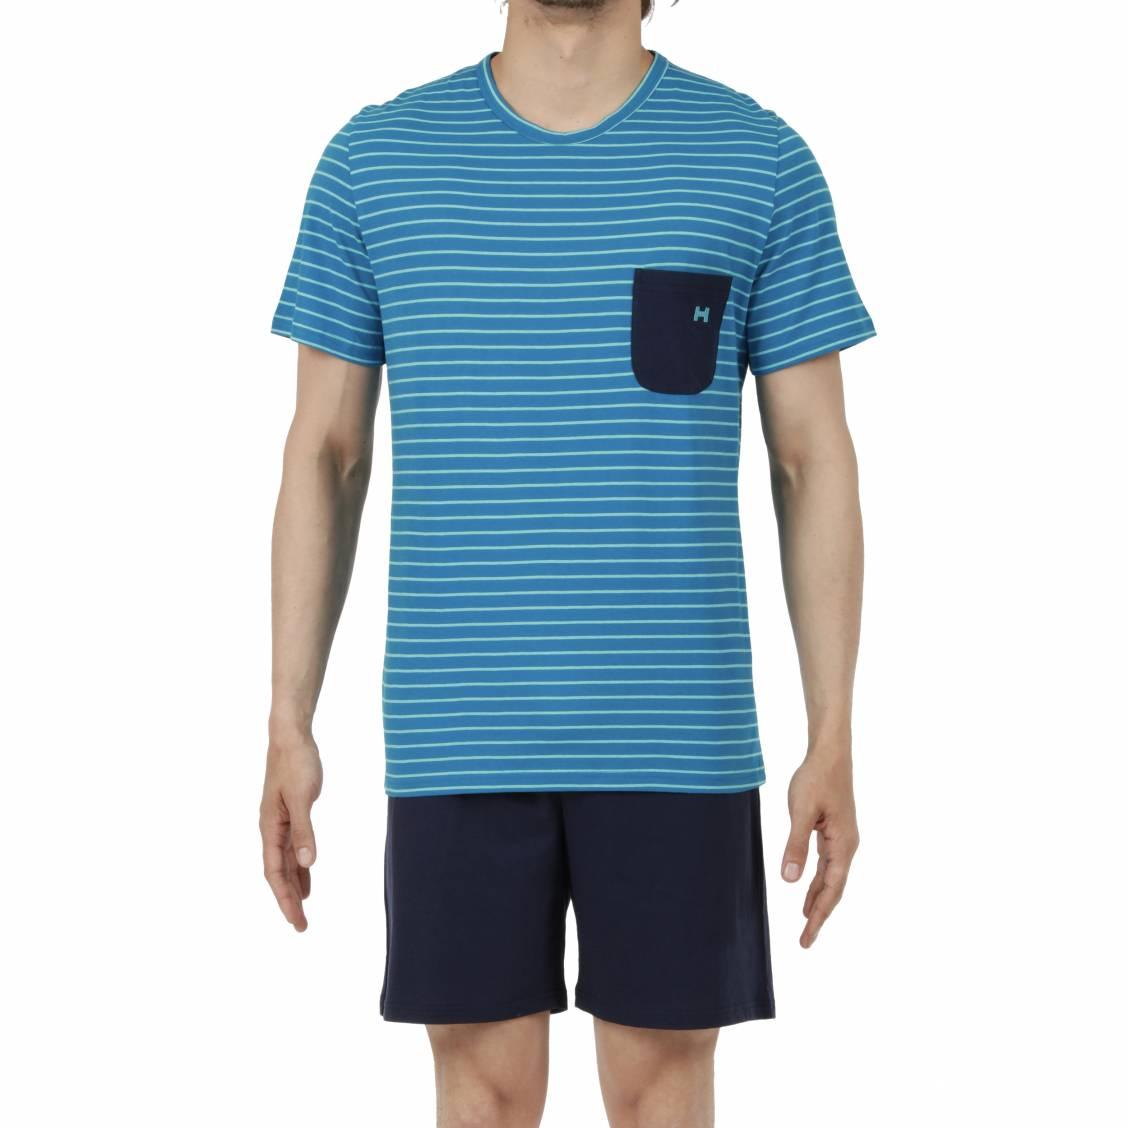 3ab7e14521 Pyjama court Hom Pop en coton : tee-shirt col rond à rayures bleu turquoise